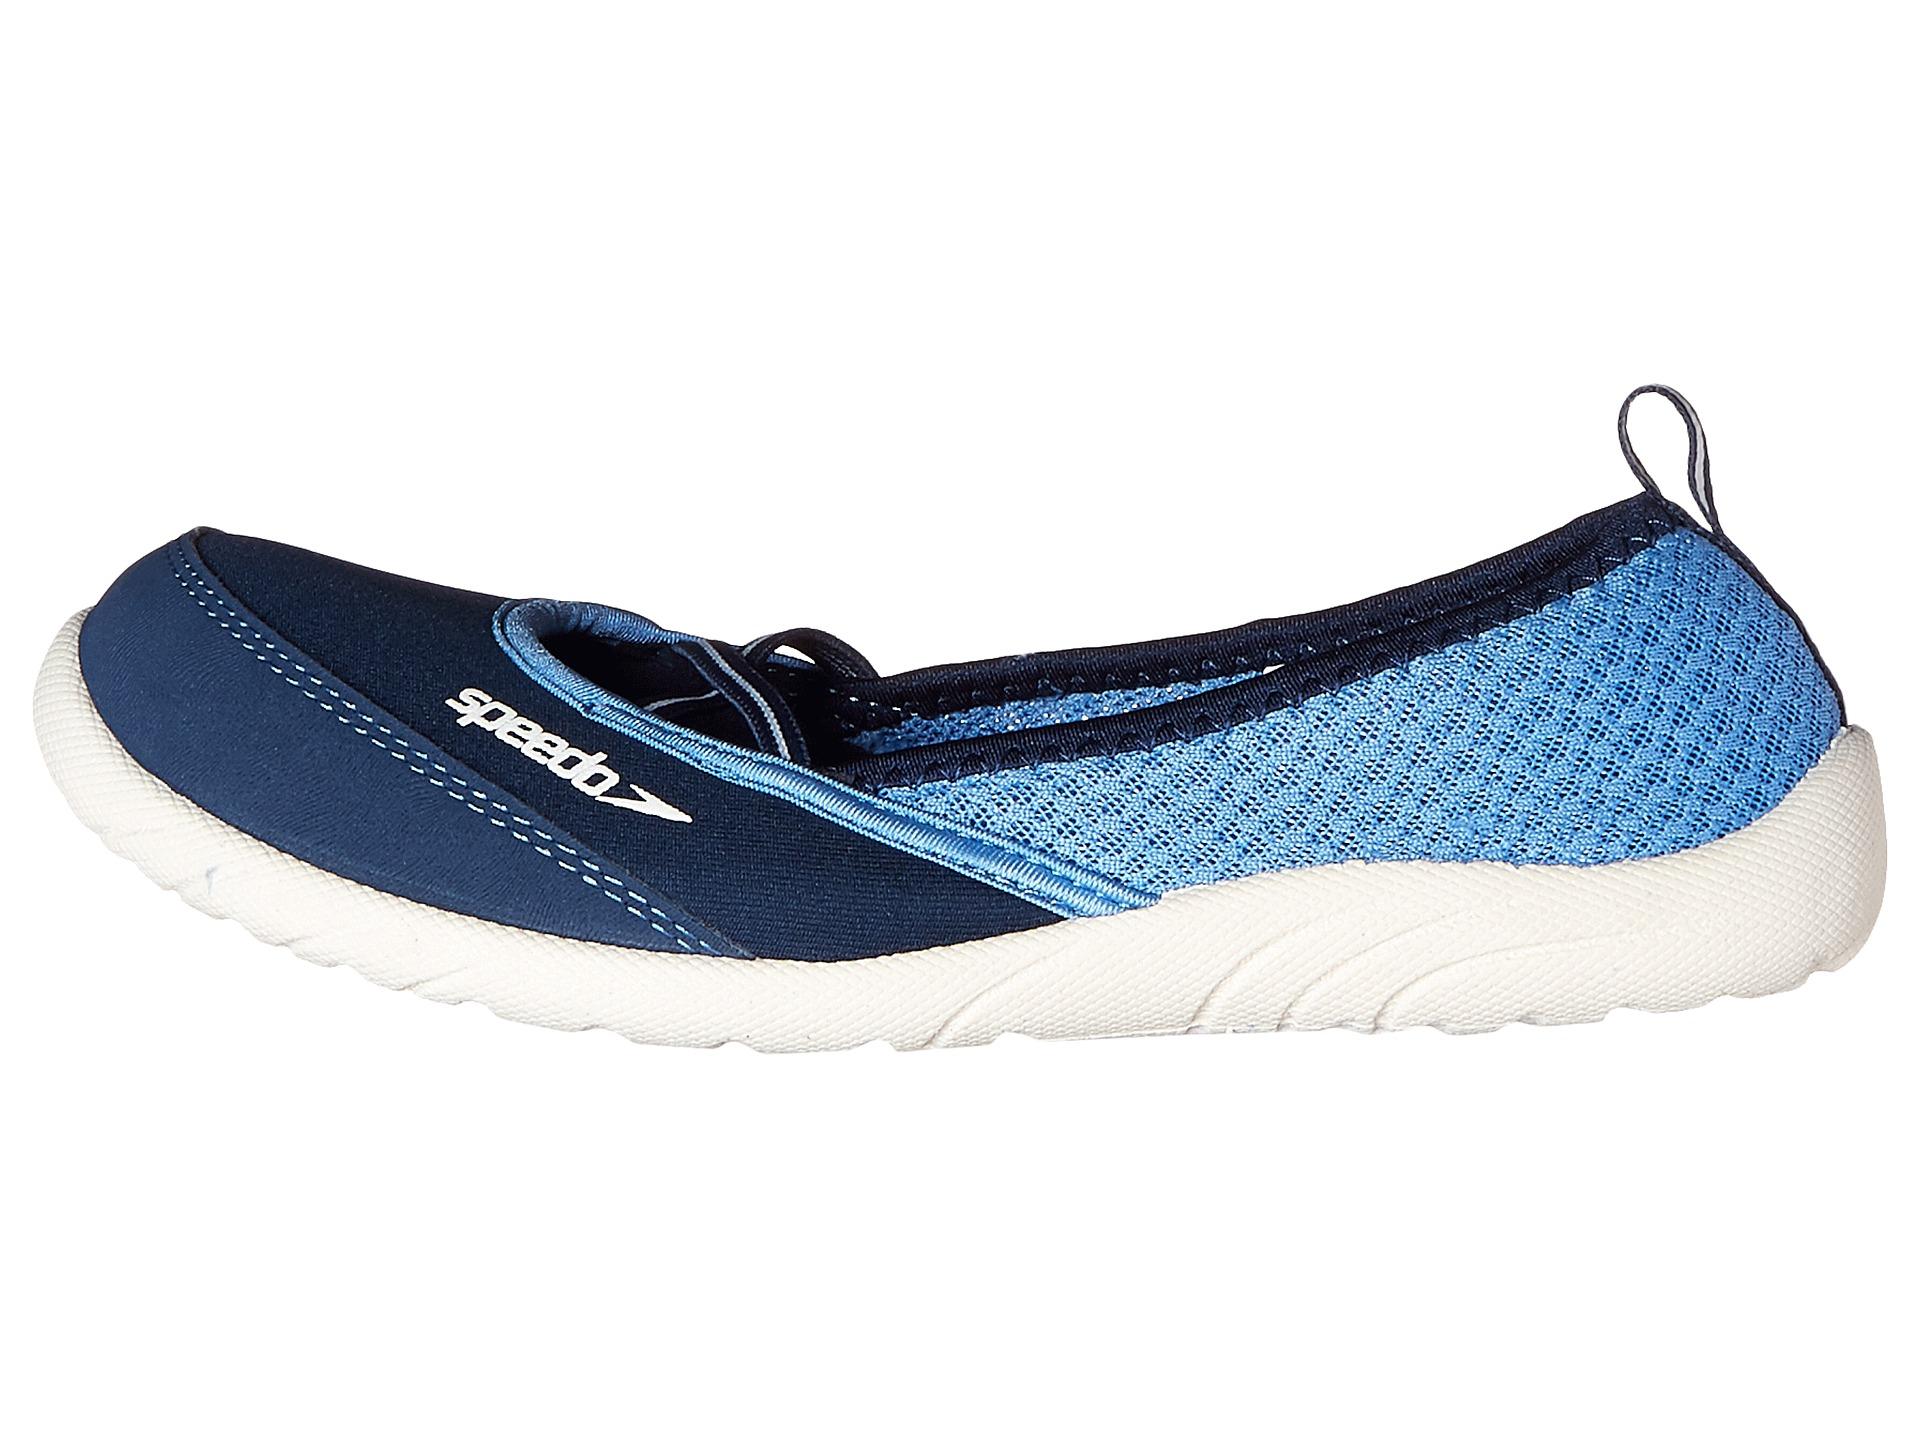 Speedo Women S Beachrunner   Water Shoe